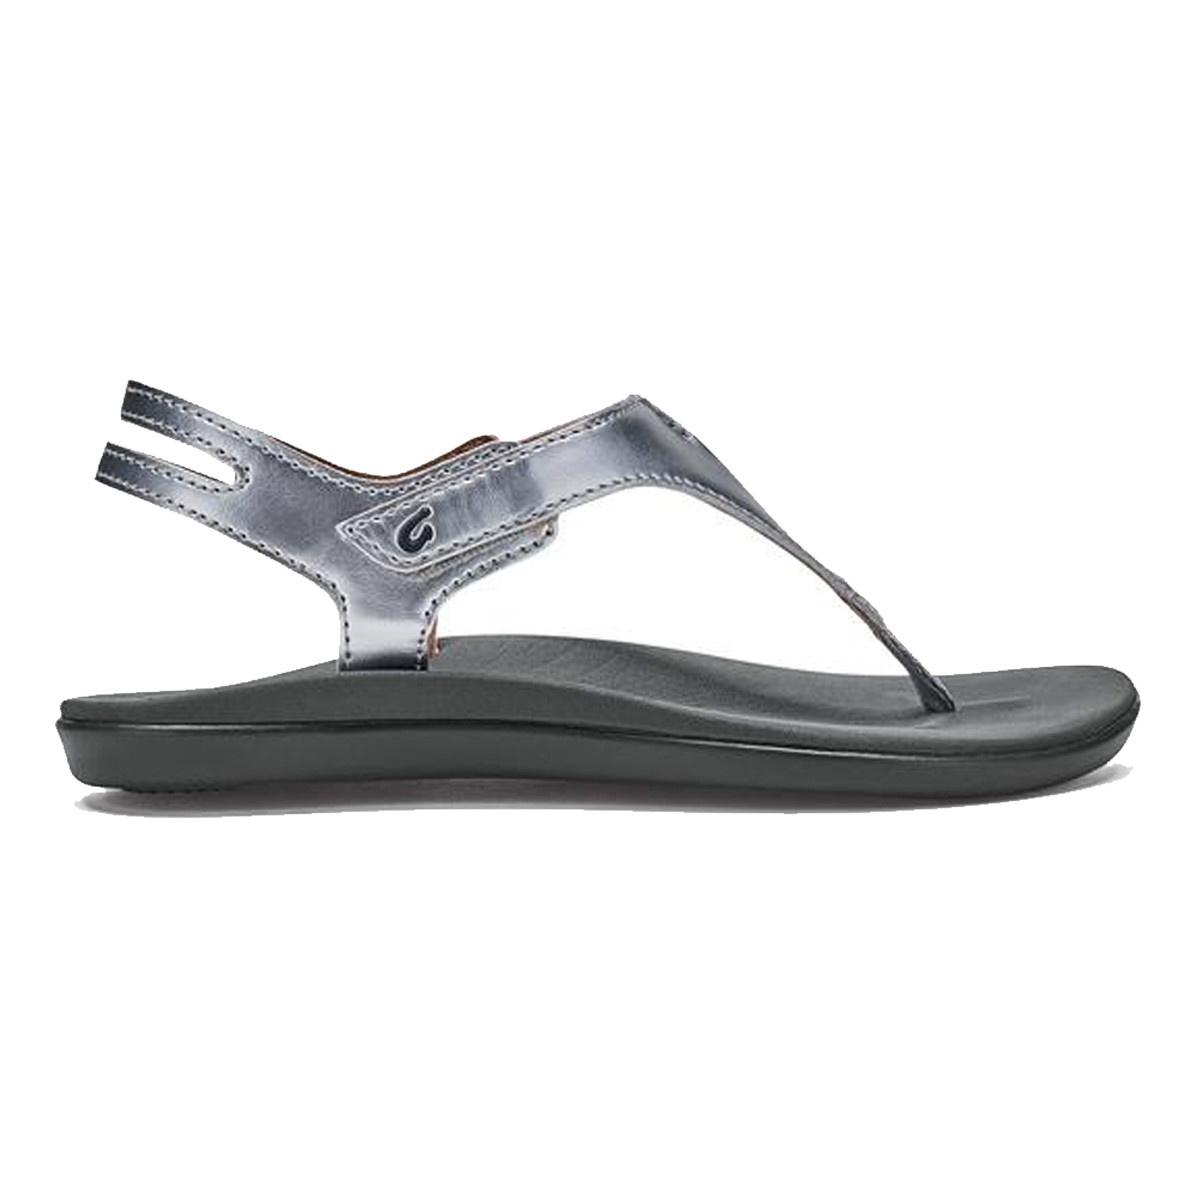 OluKai Olukai Girls Eheu Sandal Silver/Charcoal